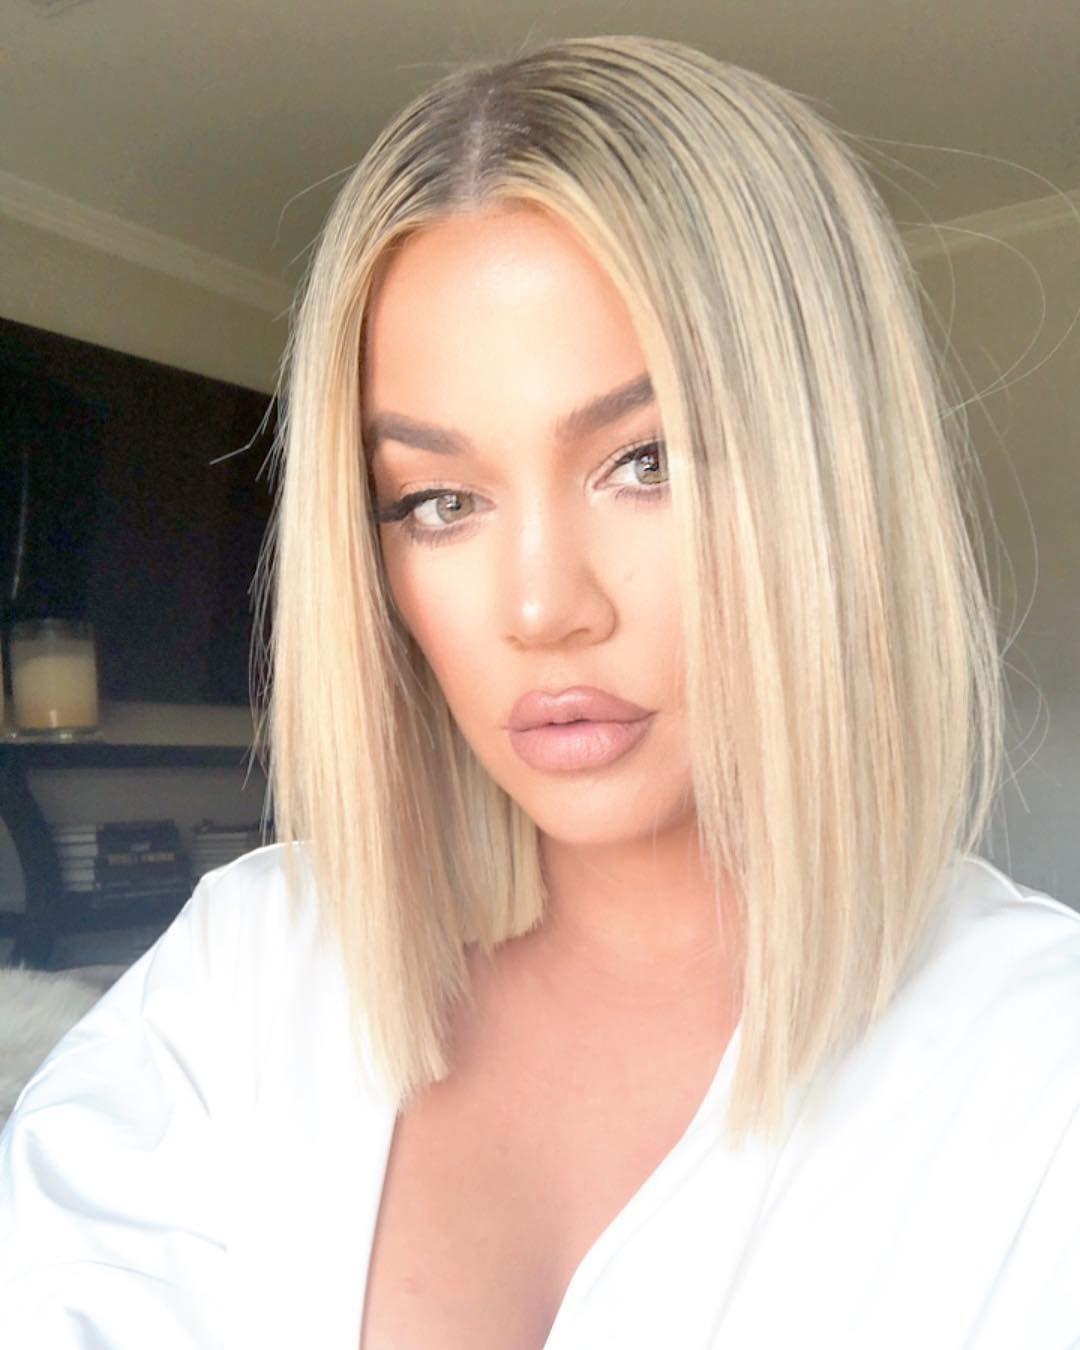 Khloé Kardashian Just Got a Crazy-Short Bob